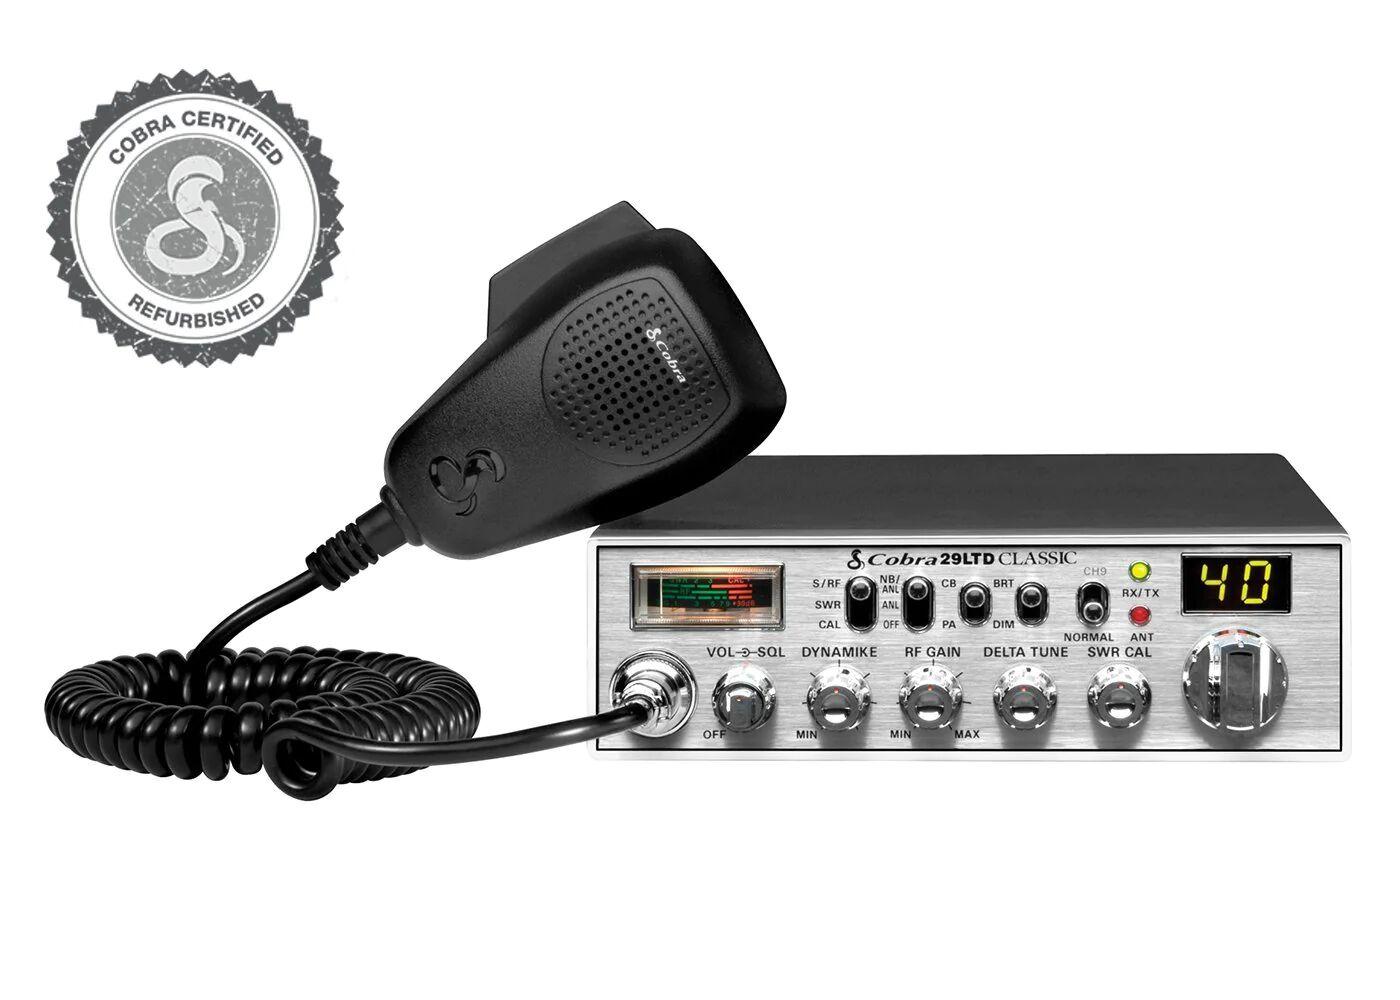 Cobra 29 LTD (Refurb) Professional CB Radio